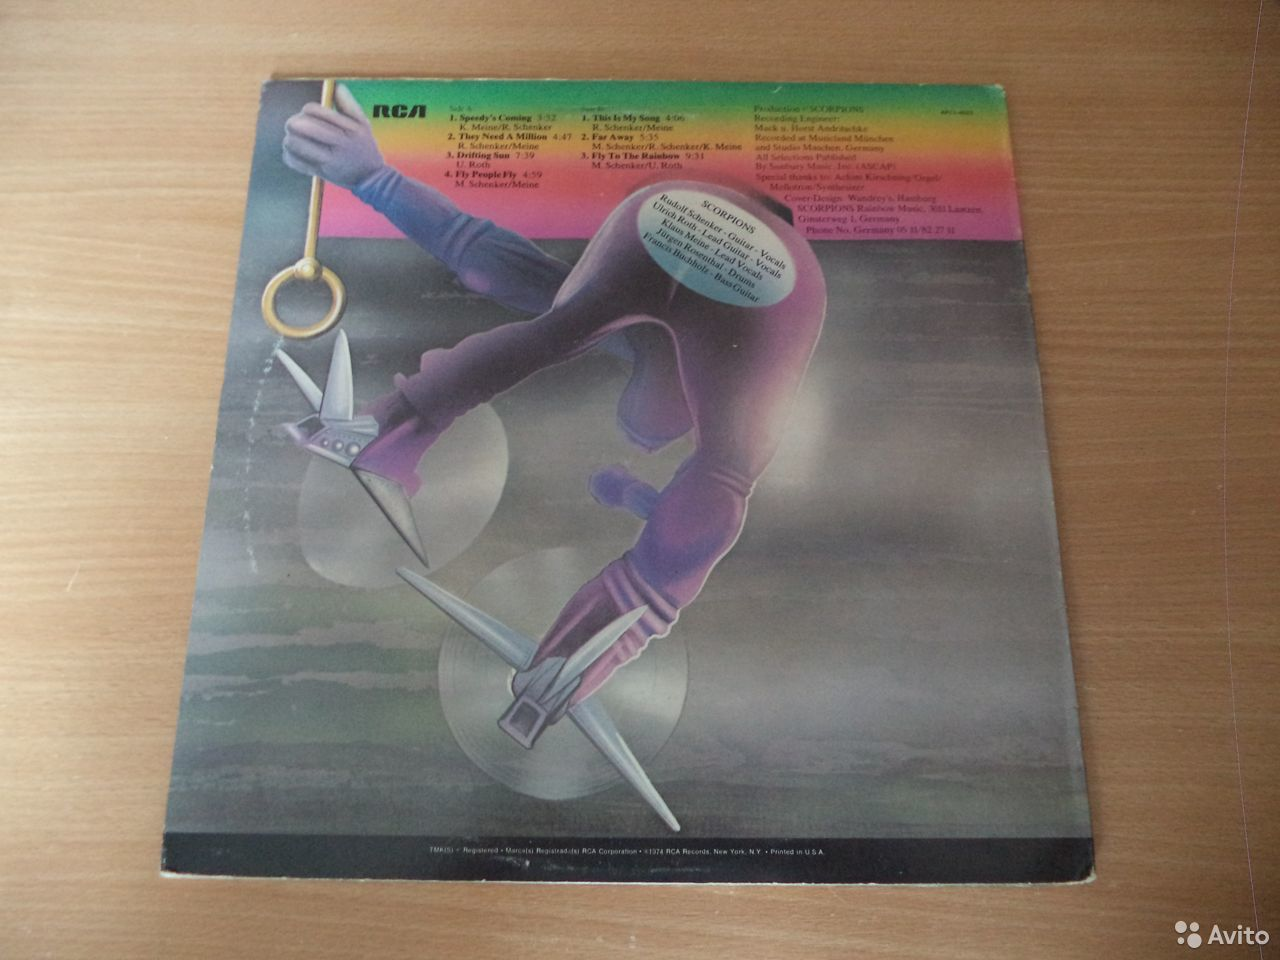 Scorpions - Fly To The Rainbow USA LP(Винил)